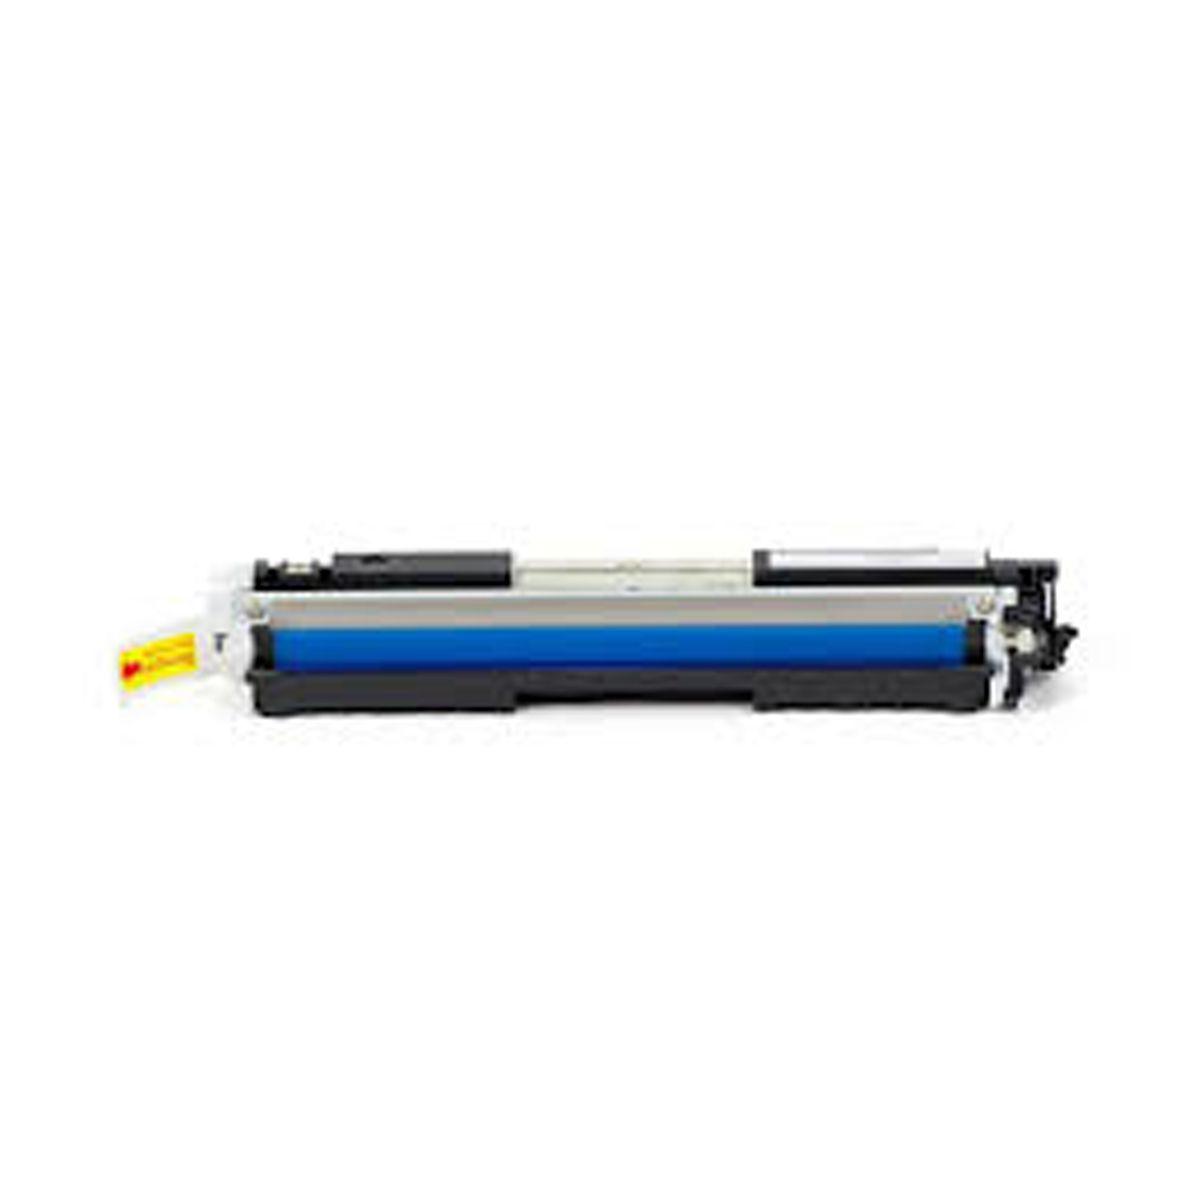 Toner Compativel com HP CE311A CE311 311A 311 126A Ciano - 1025 CP1025 M175 - 1K